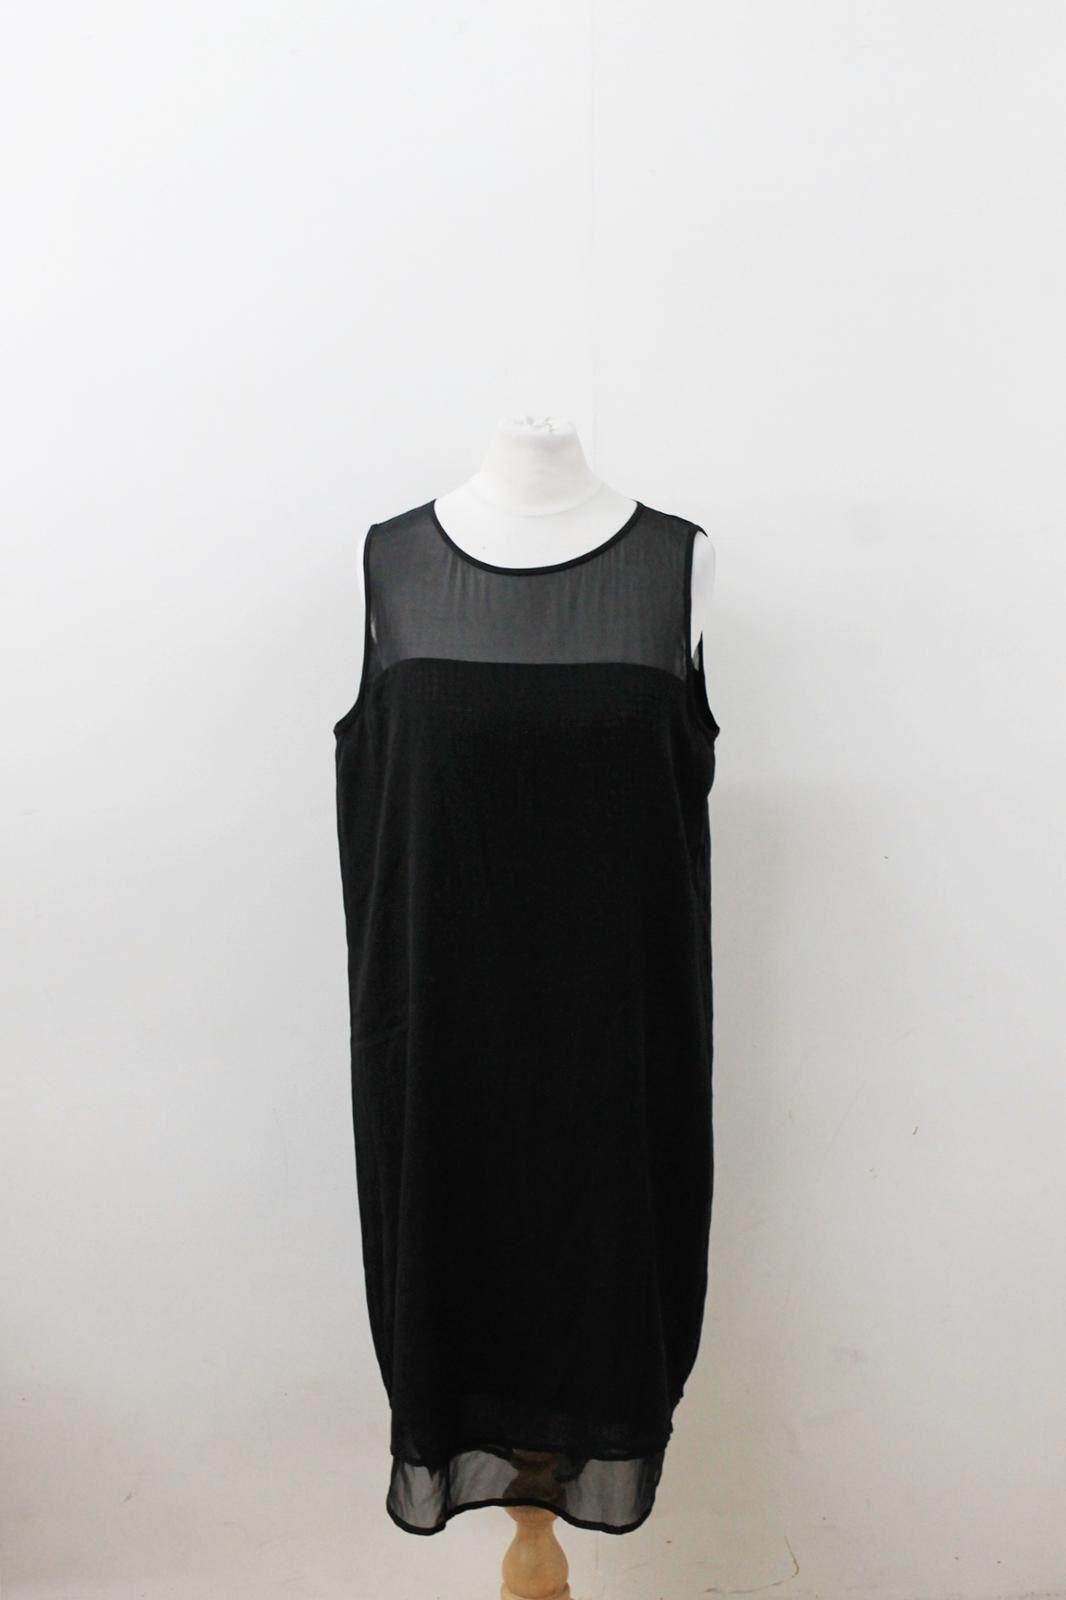 DKNY Ladies schwarz Silk Blend Sleeveless Sequined Double Layerot Dress Größe S